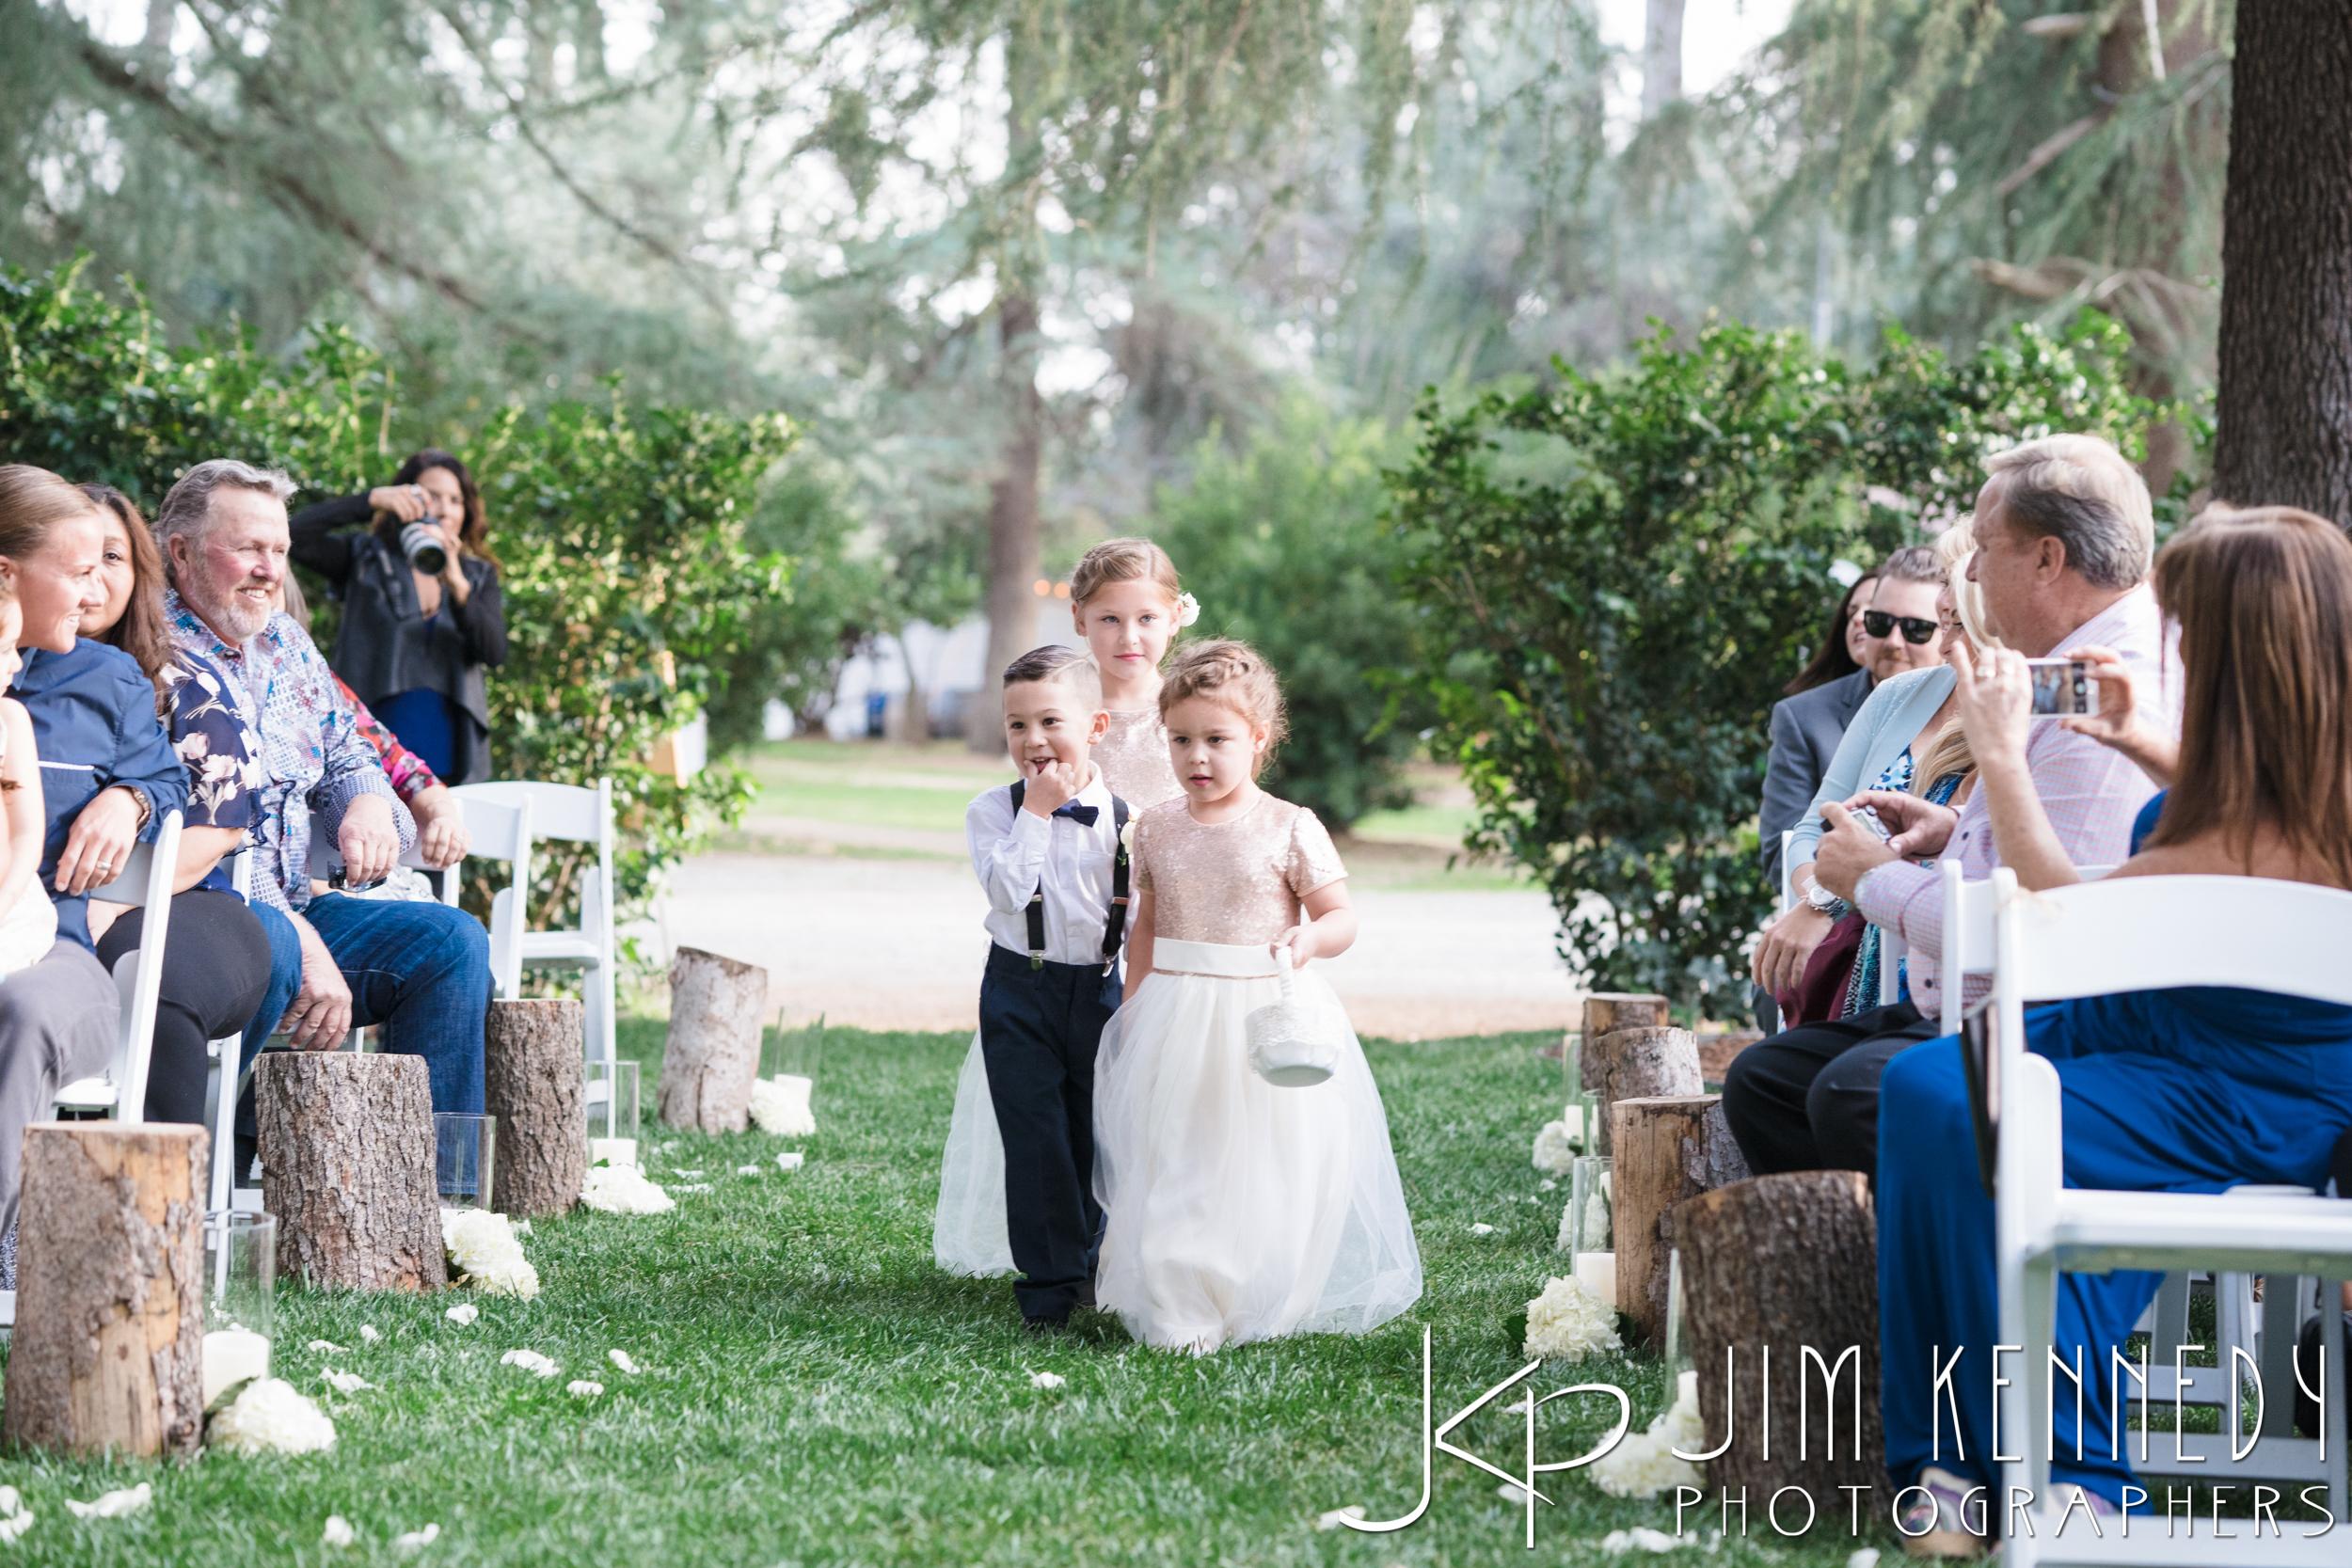 jim_kennedy_photographers_highland_springs_wedding_caitlyn_0100.jpg